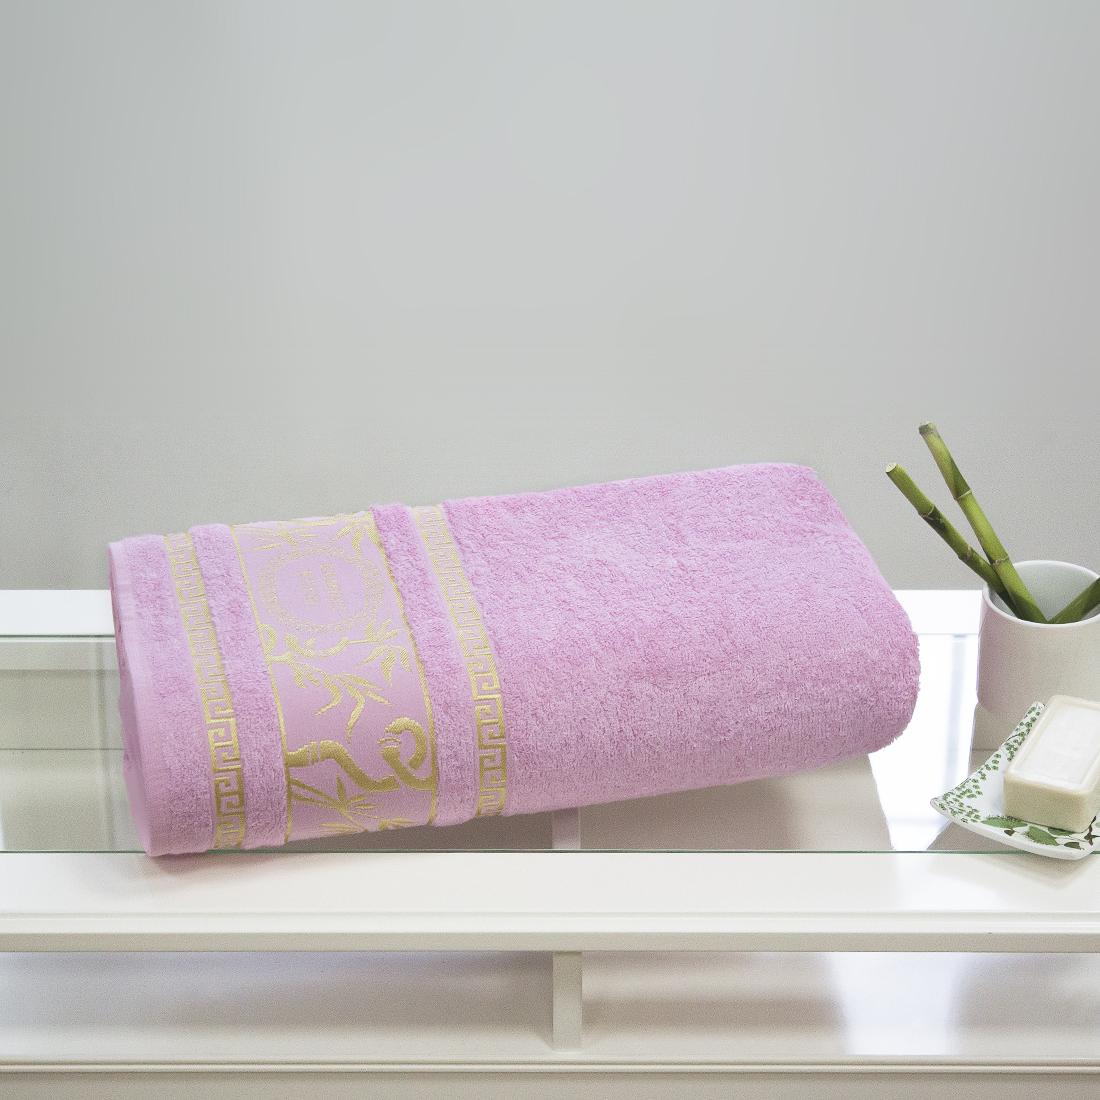 Полотенца Juanna Полотенце Роял Цвет: Розовый (70х140см) полотенце мах familon evidence велюровое 70х140см серое